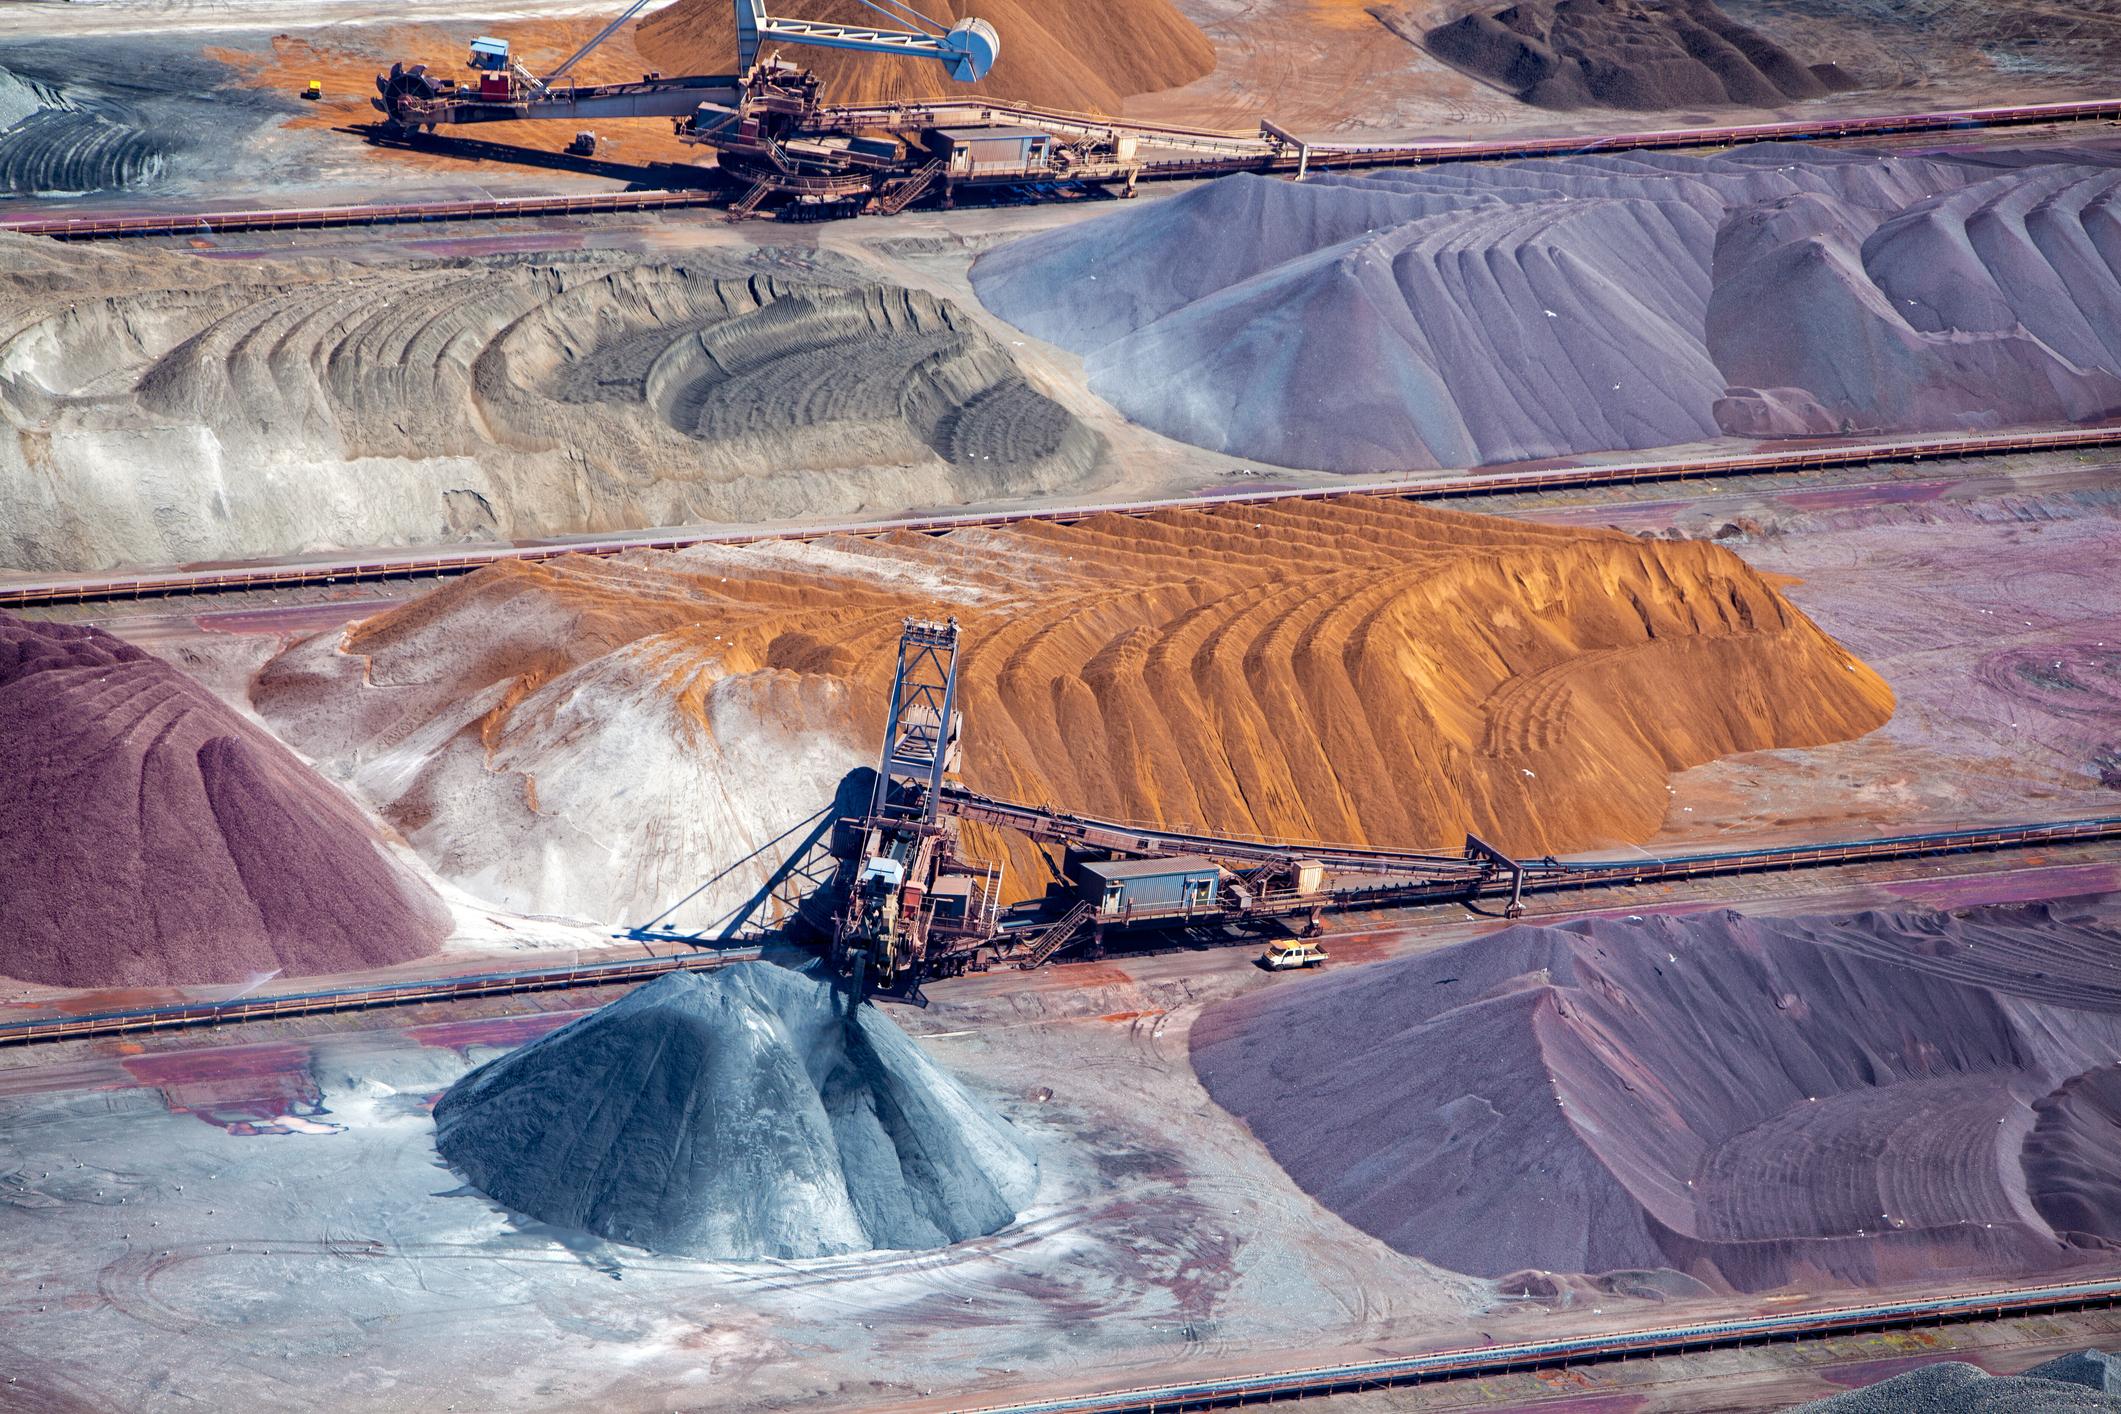 Iron ore mining in operation